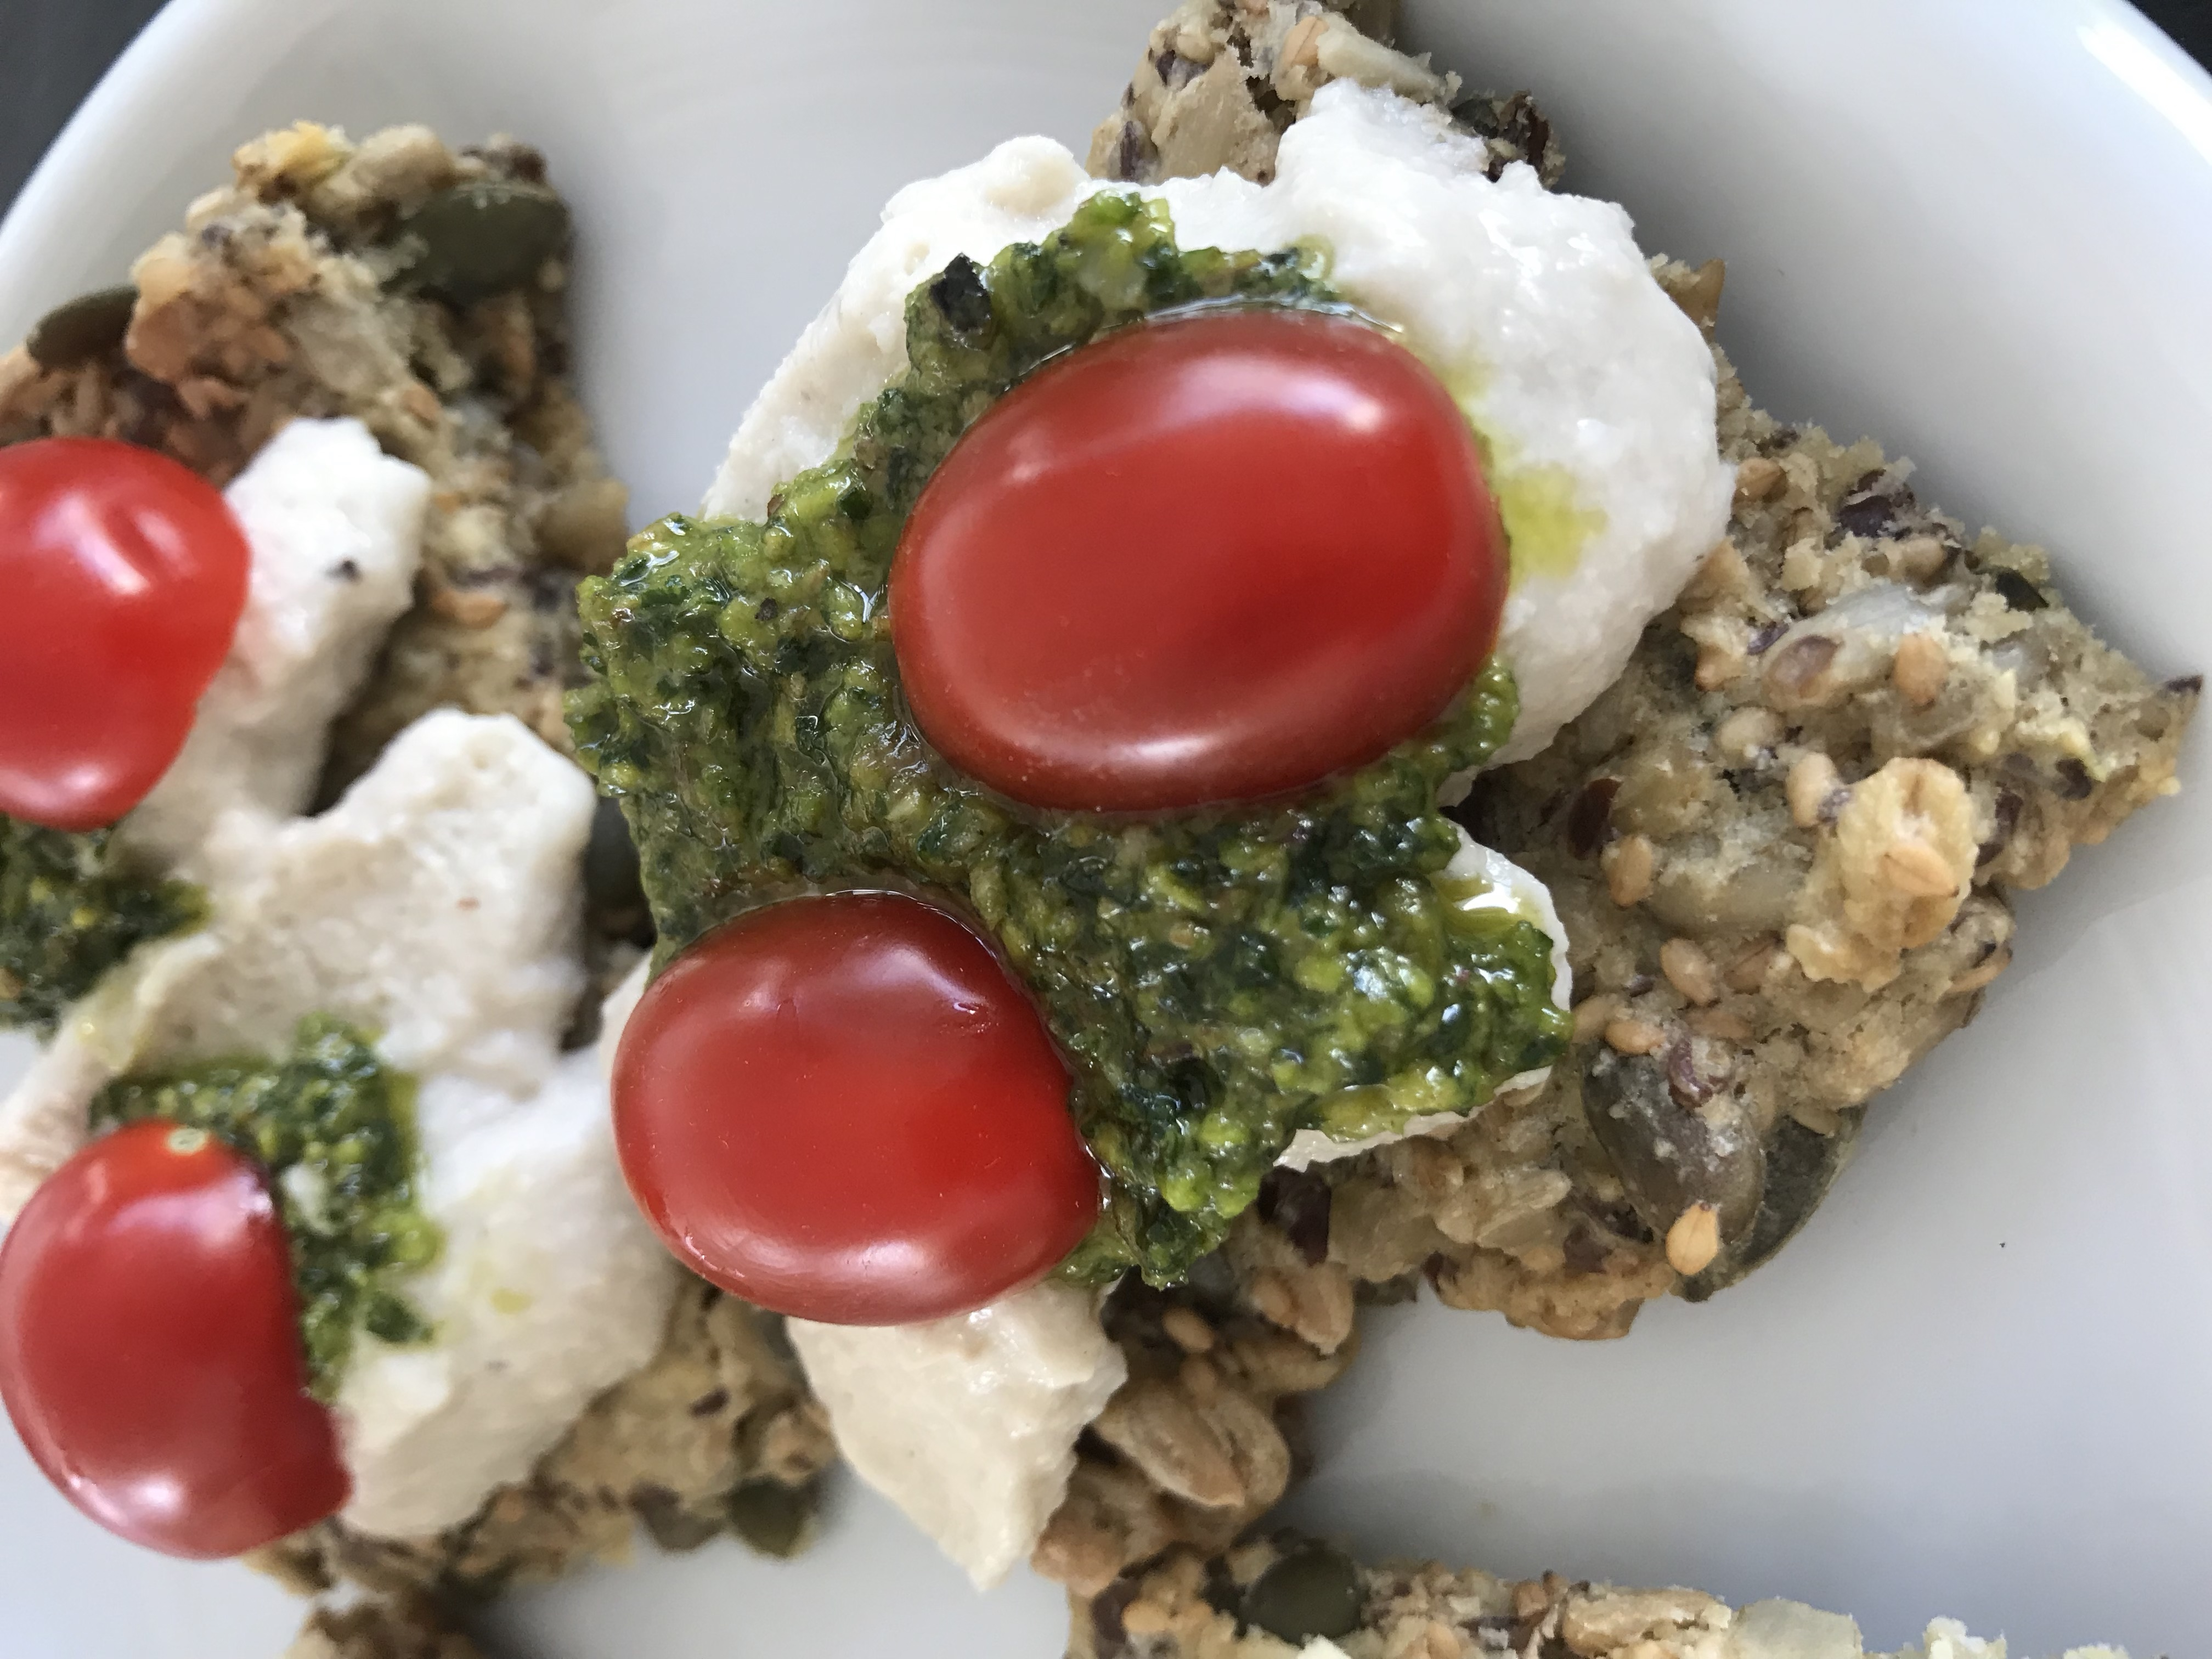 cashewmozzarella, pesto en kerstomaat